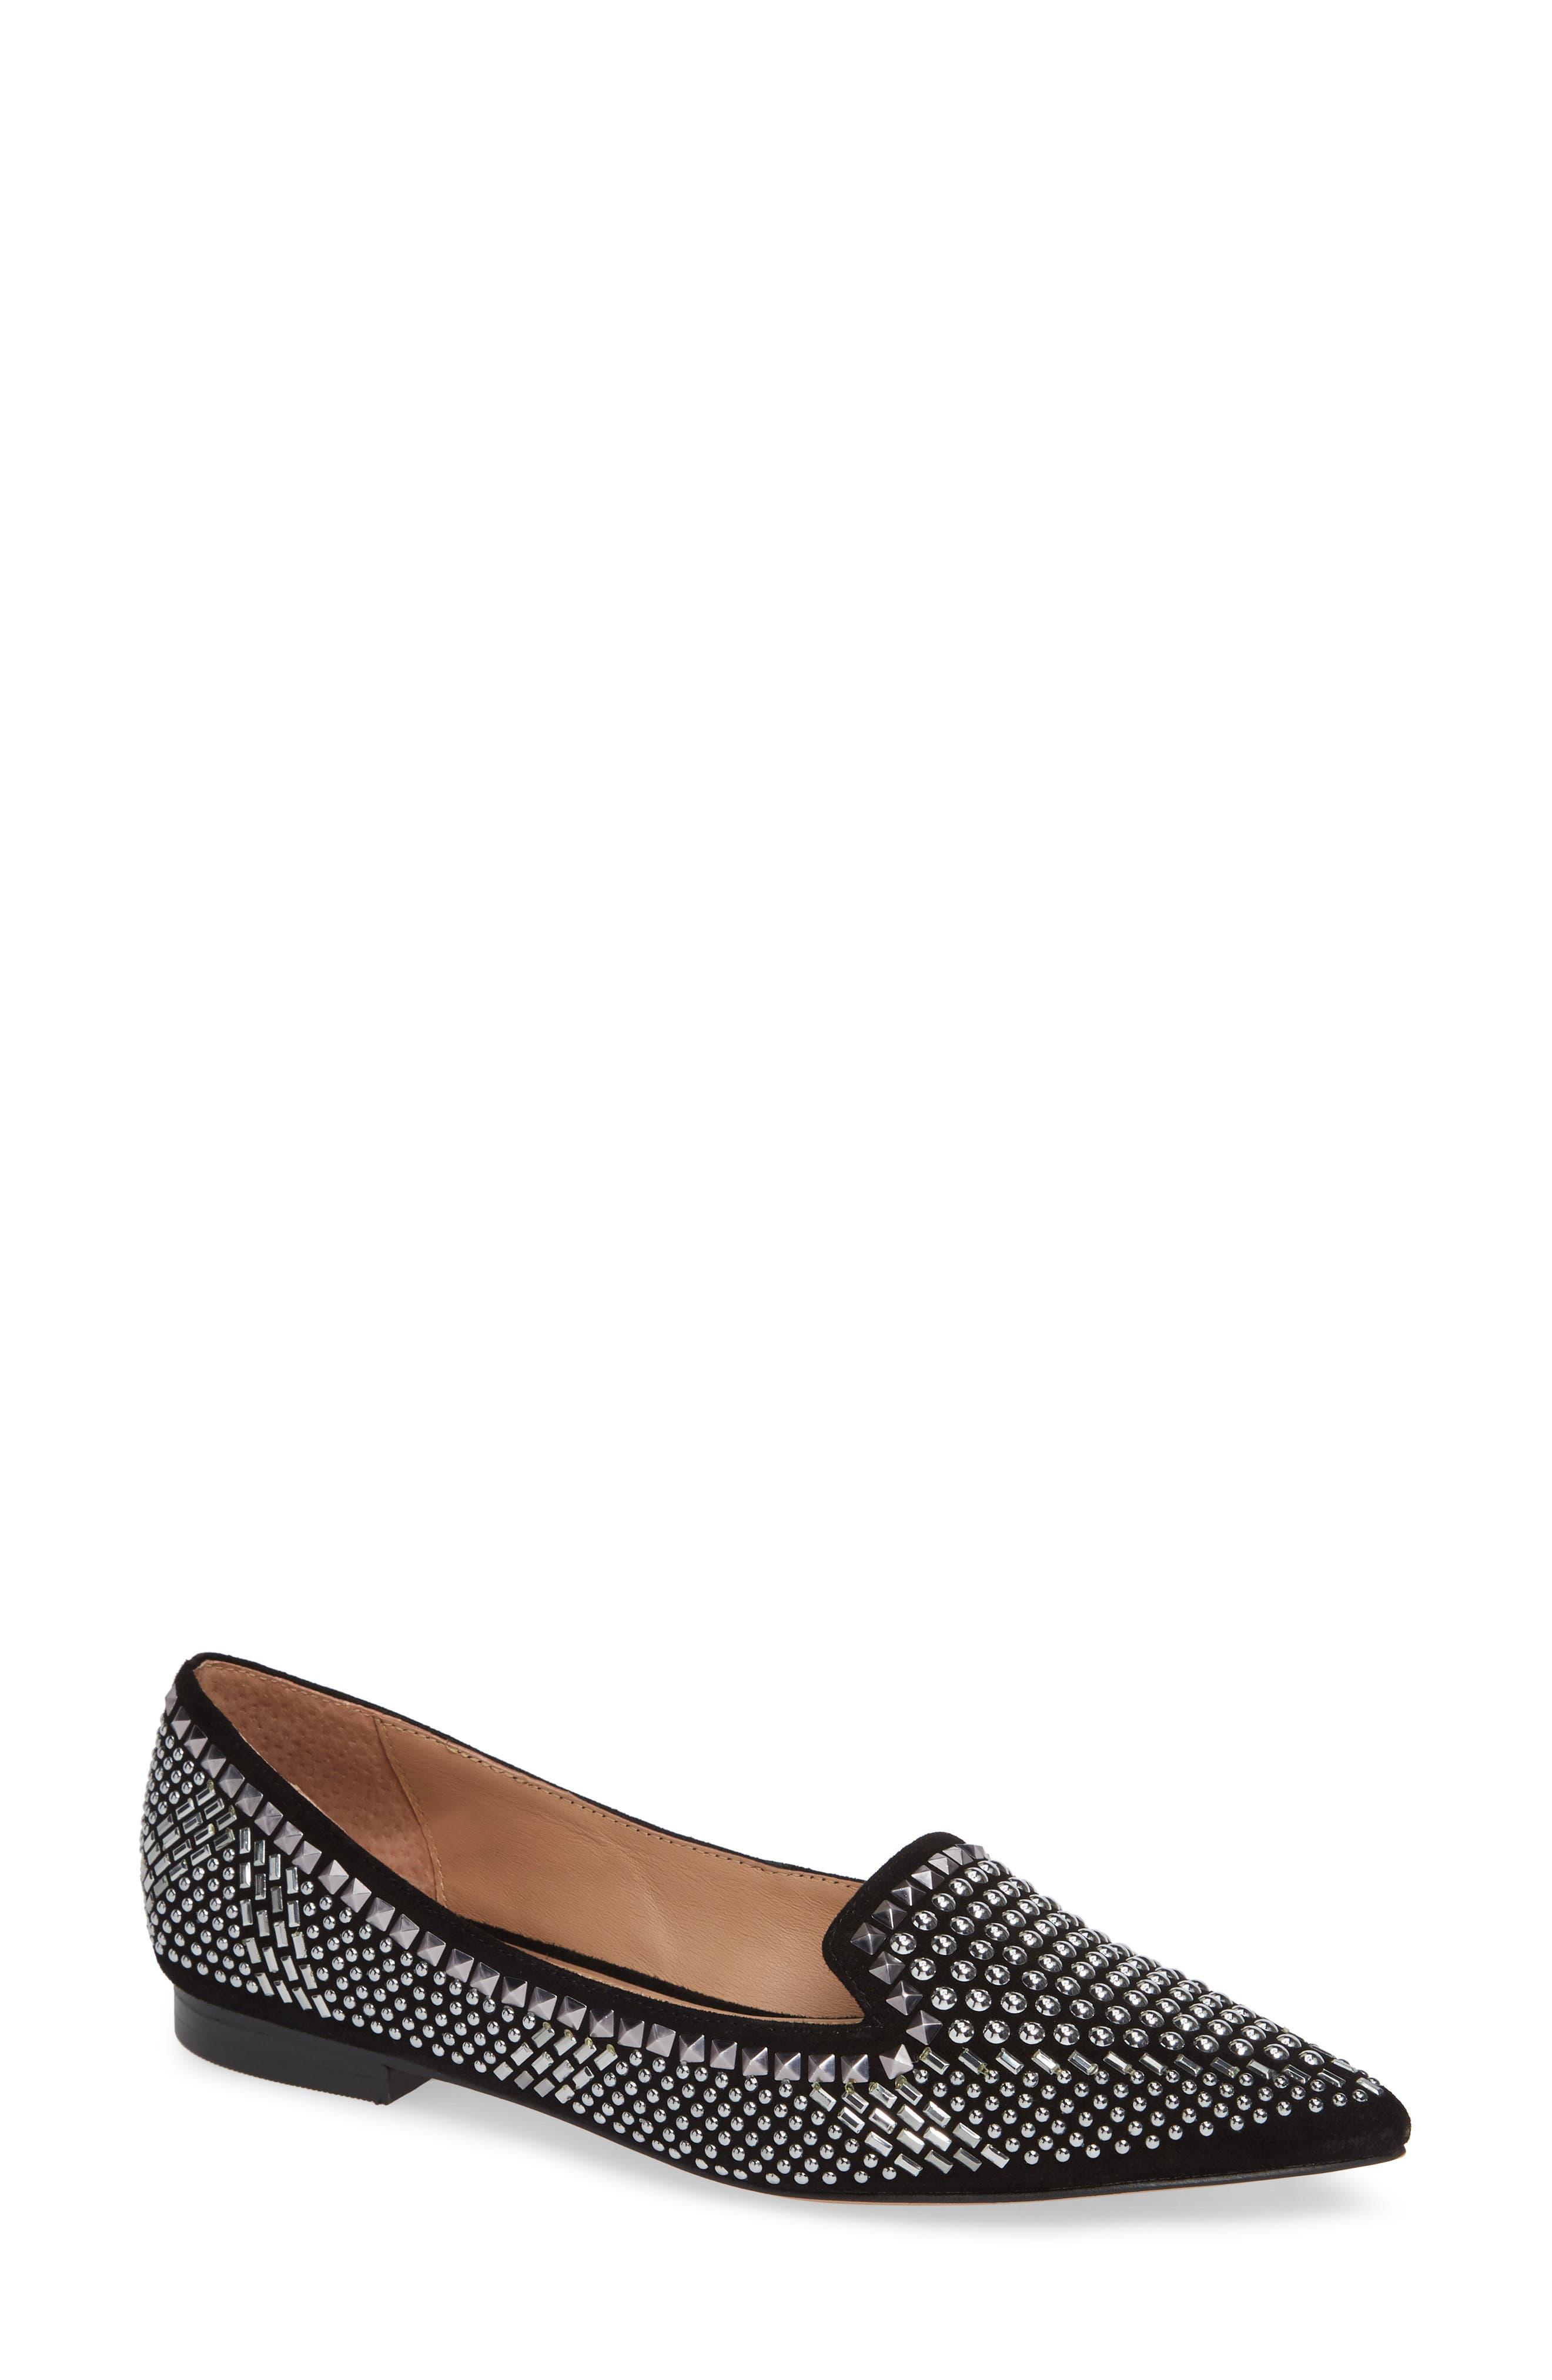 Portia Studded Loafer,                         Main,                         color, BLACK SUEDE